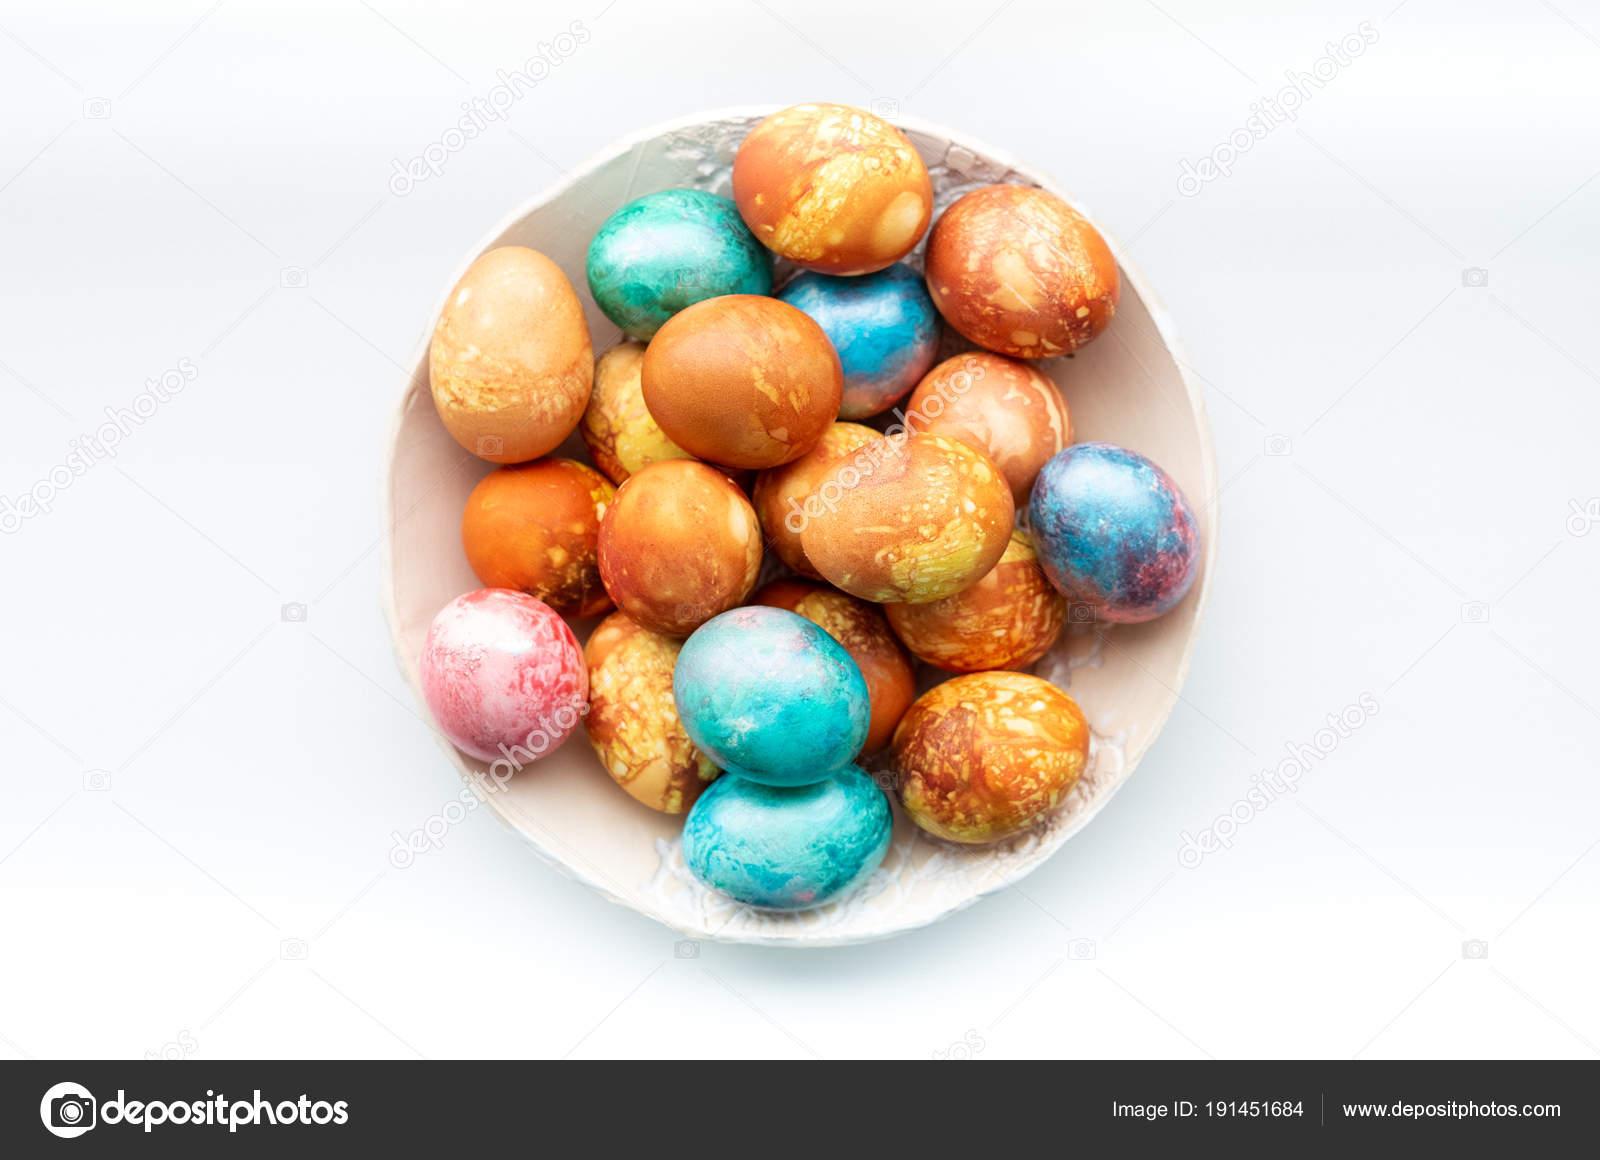 Großartig Gefärbte Ostereier Lebensmittelfarbe Bilder - Druckbare ...